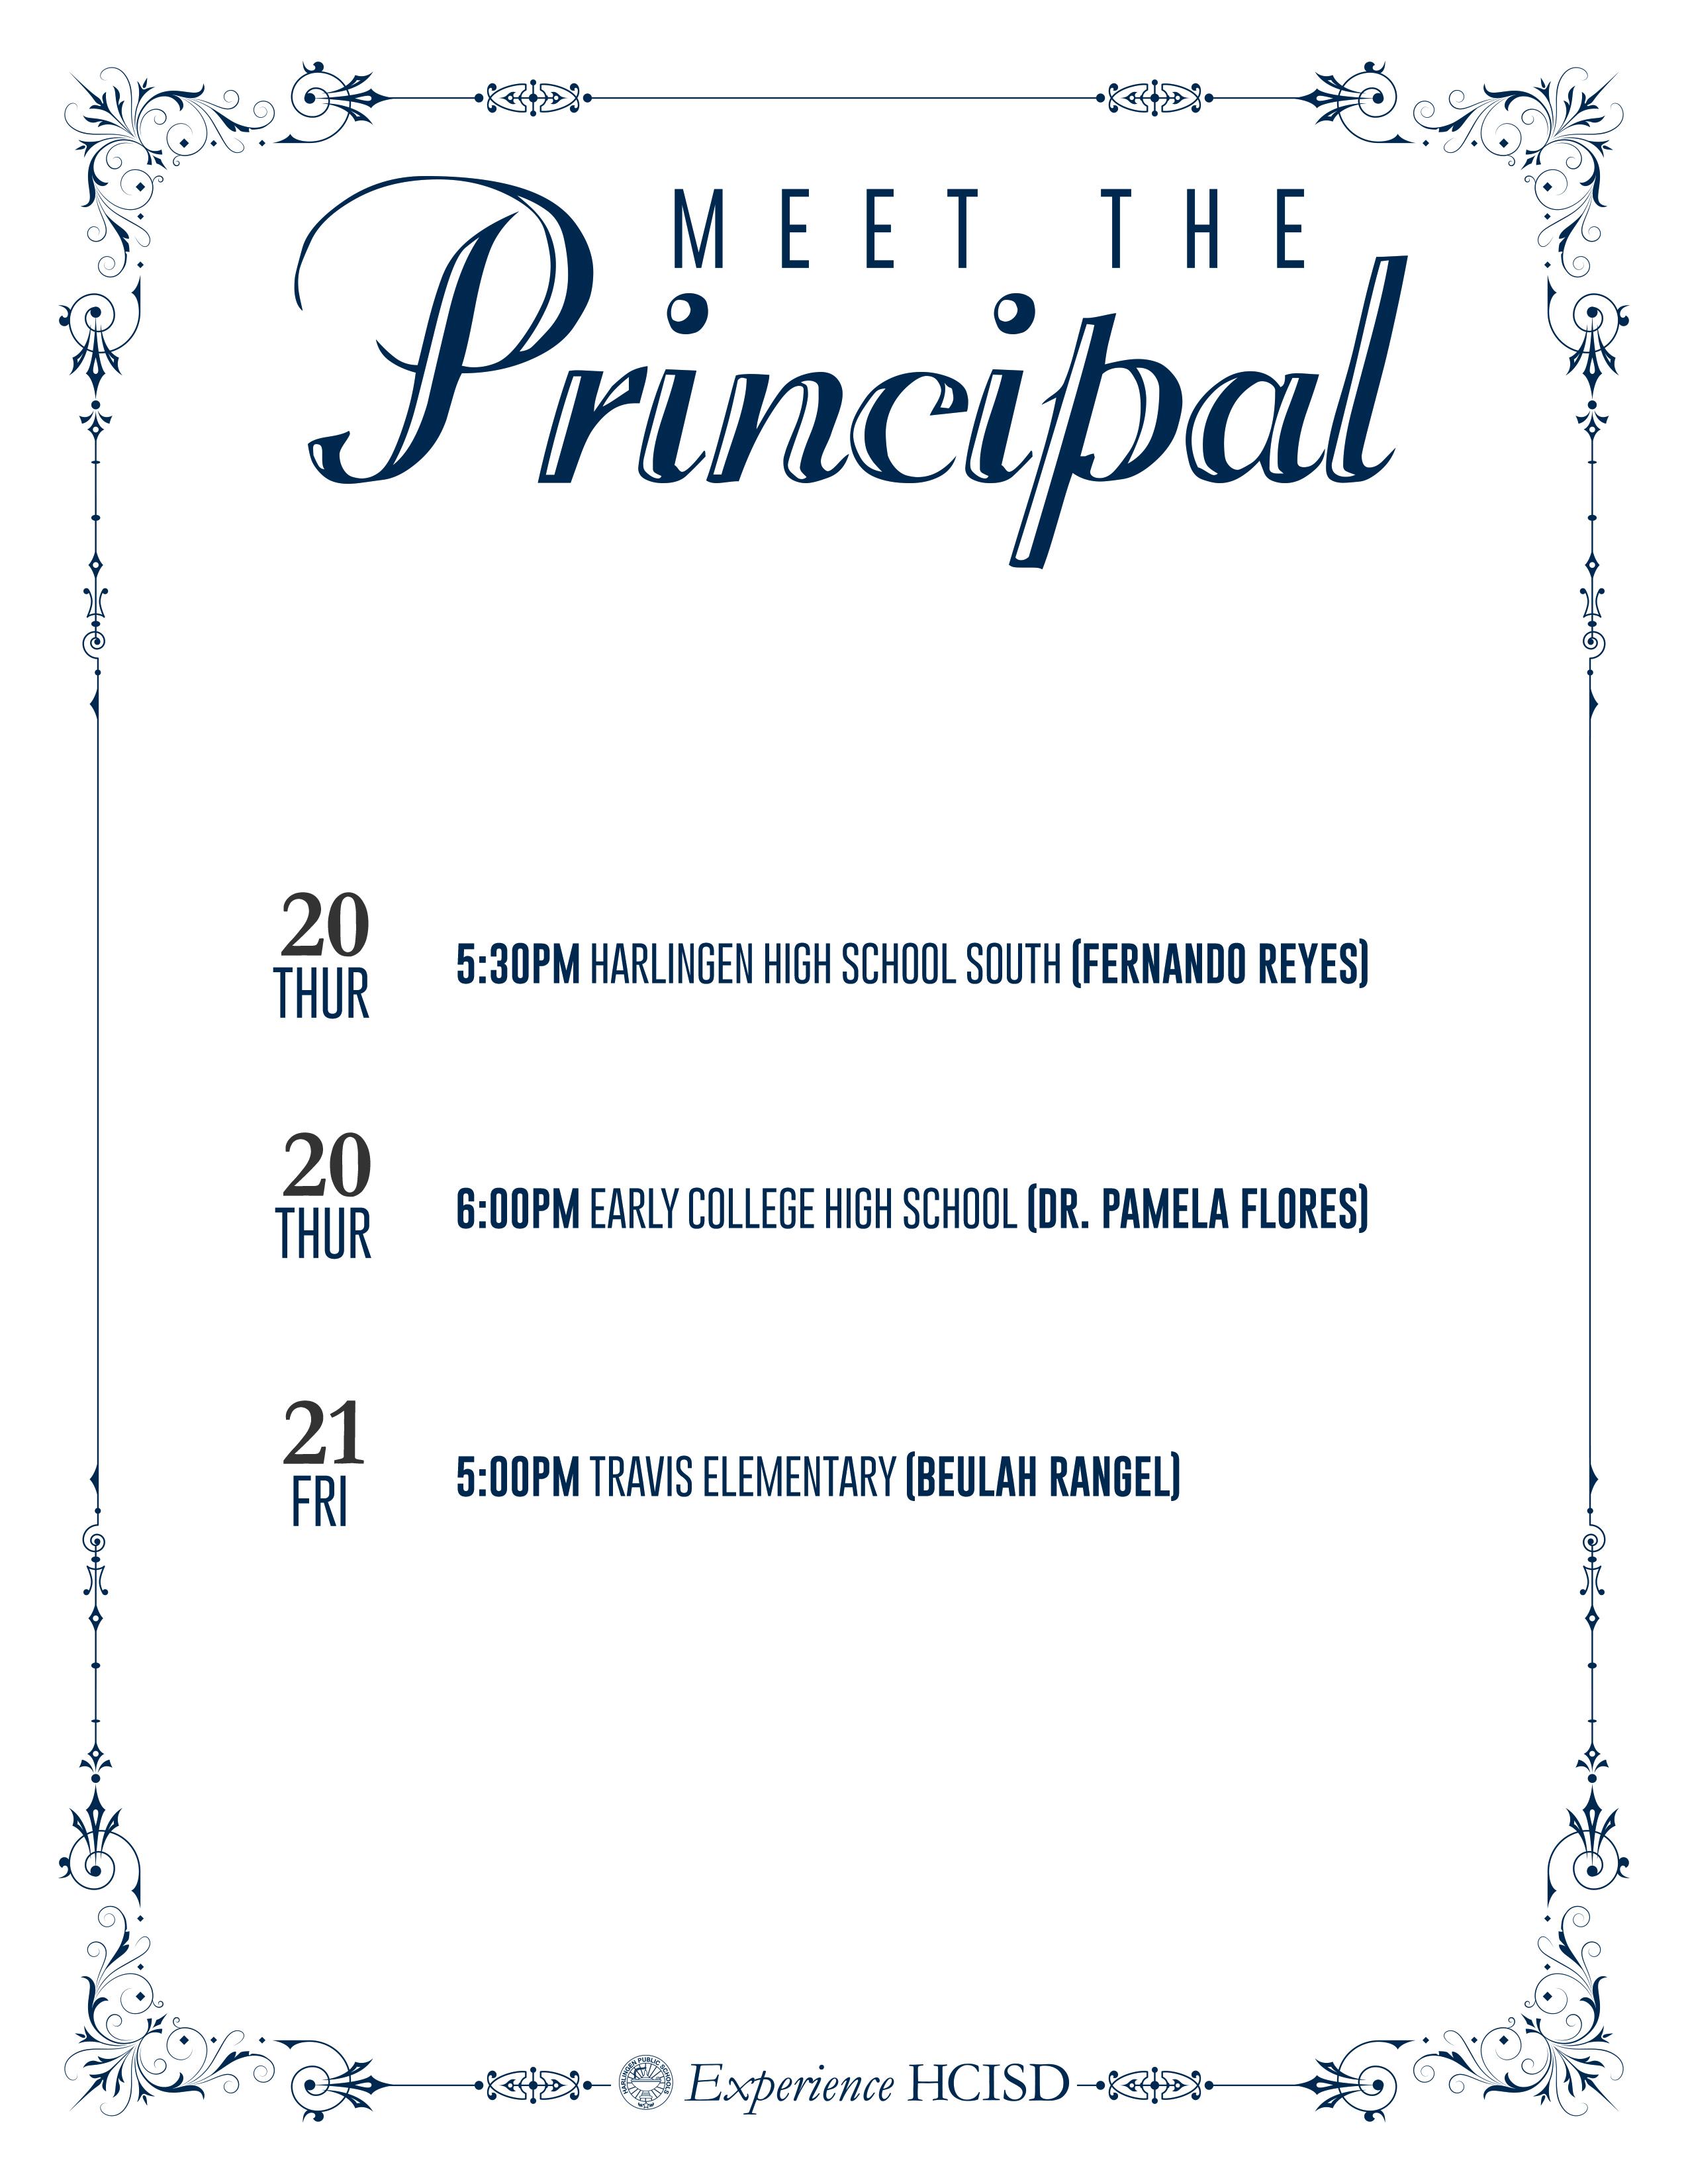 2015 Meet the Principal Events